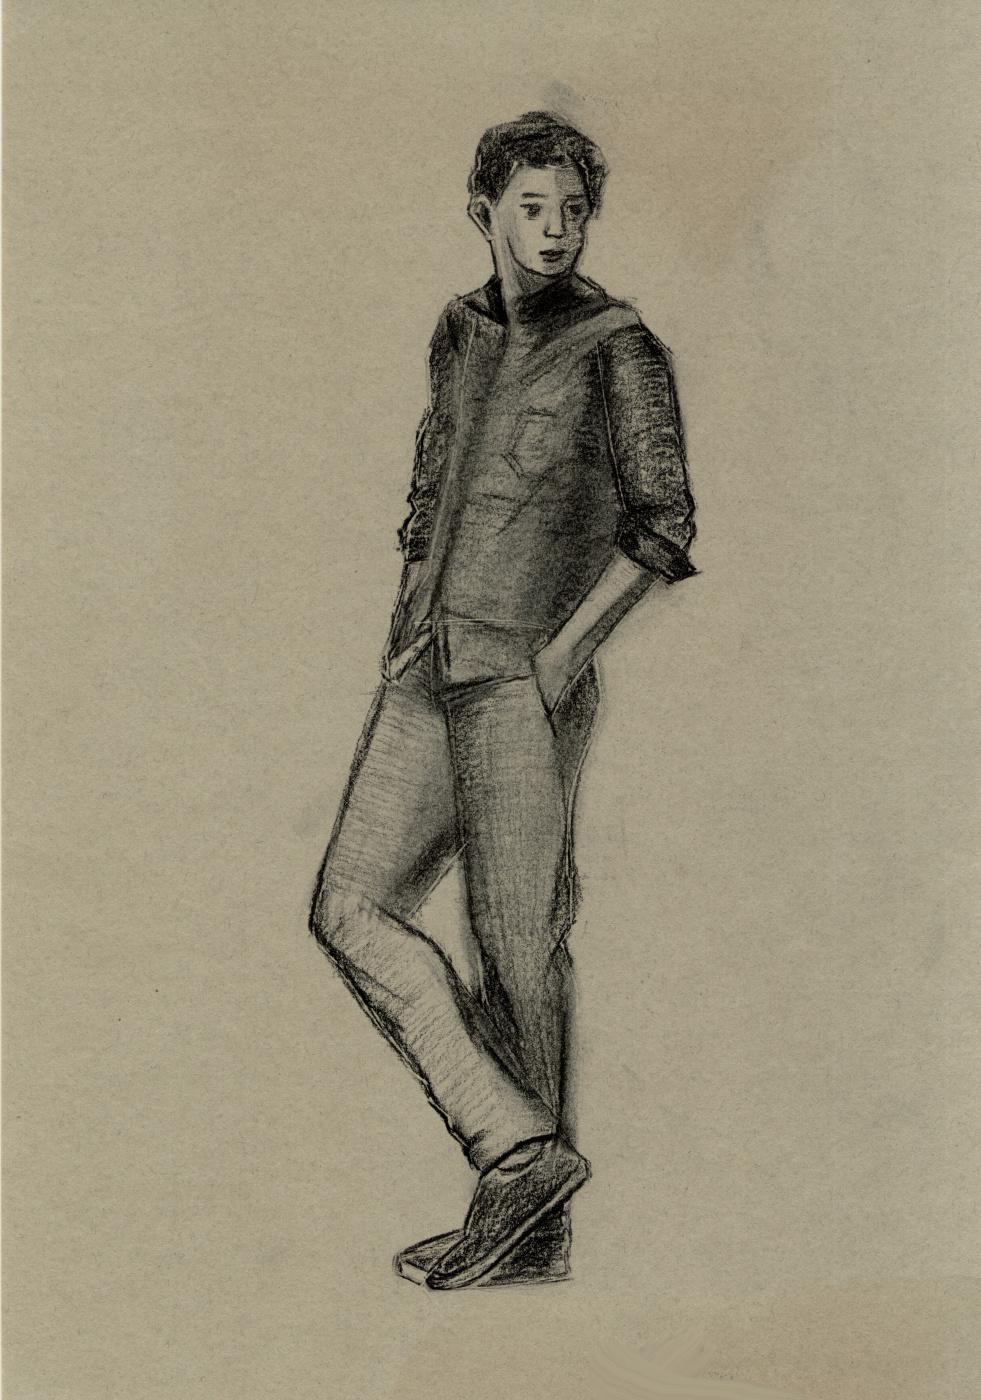 Polina. The man. Sketch